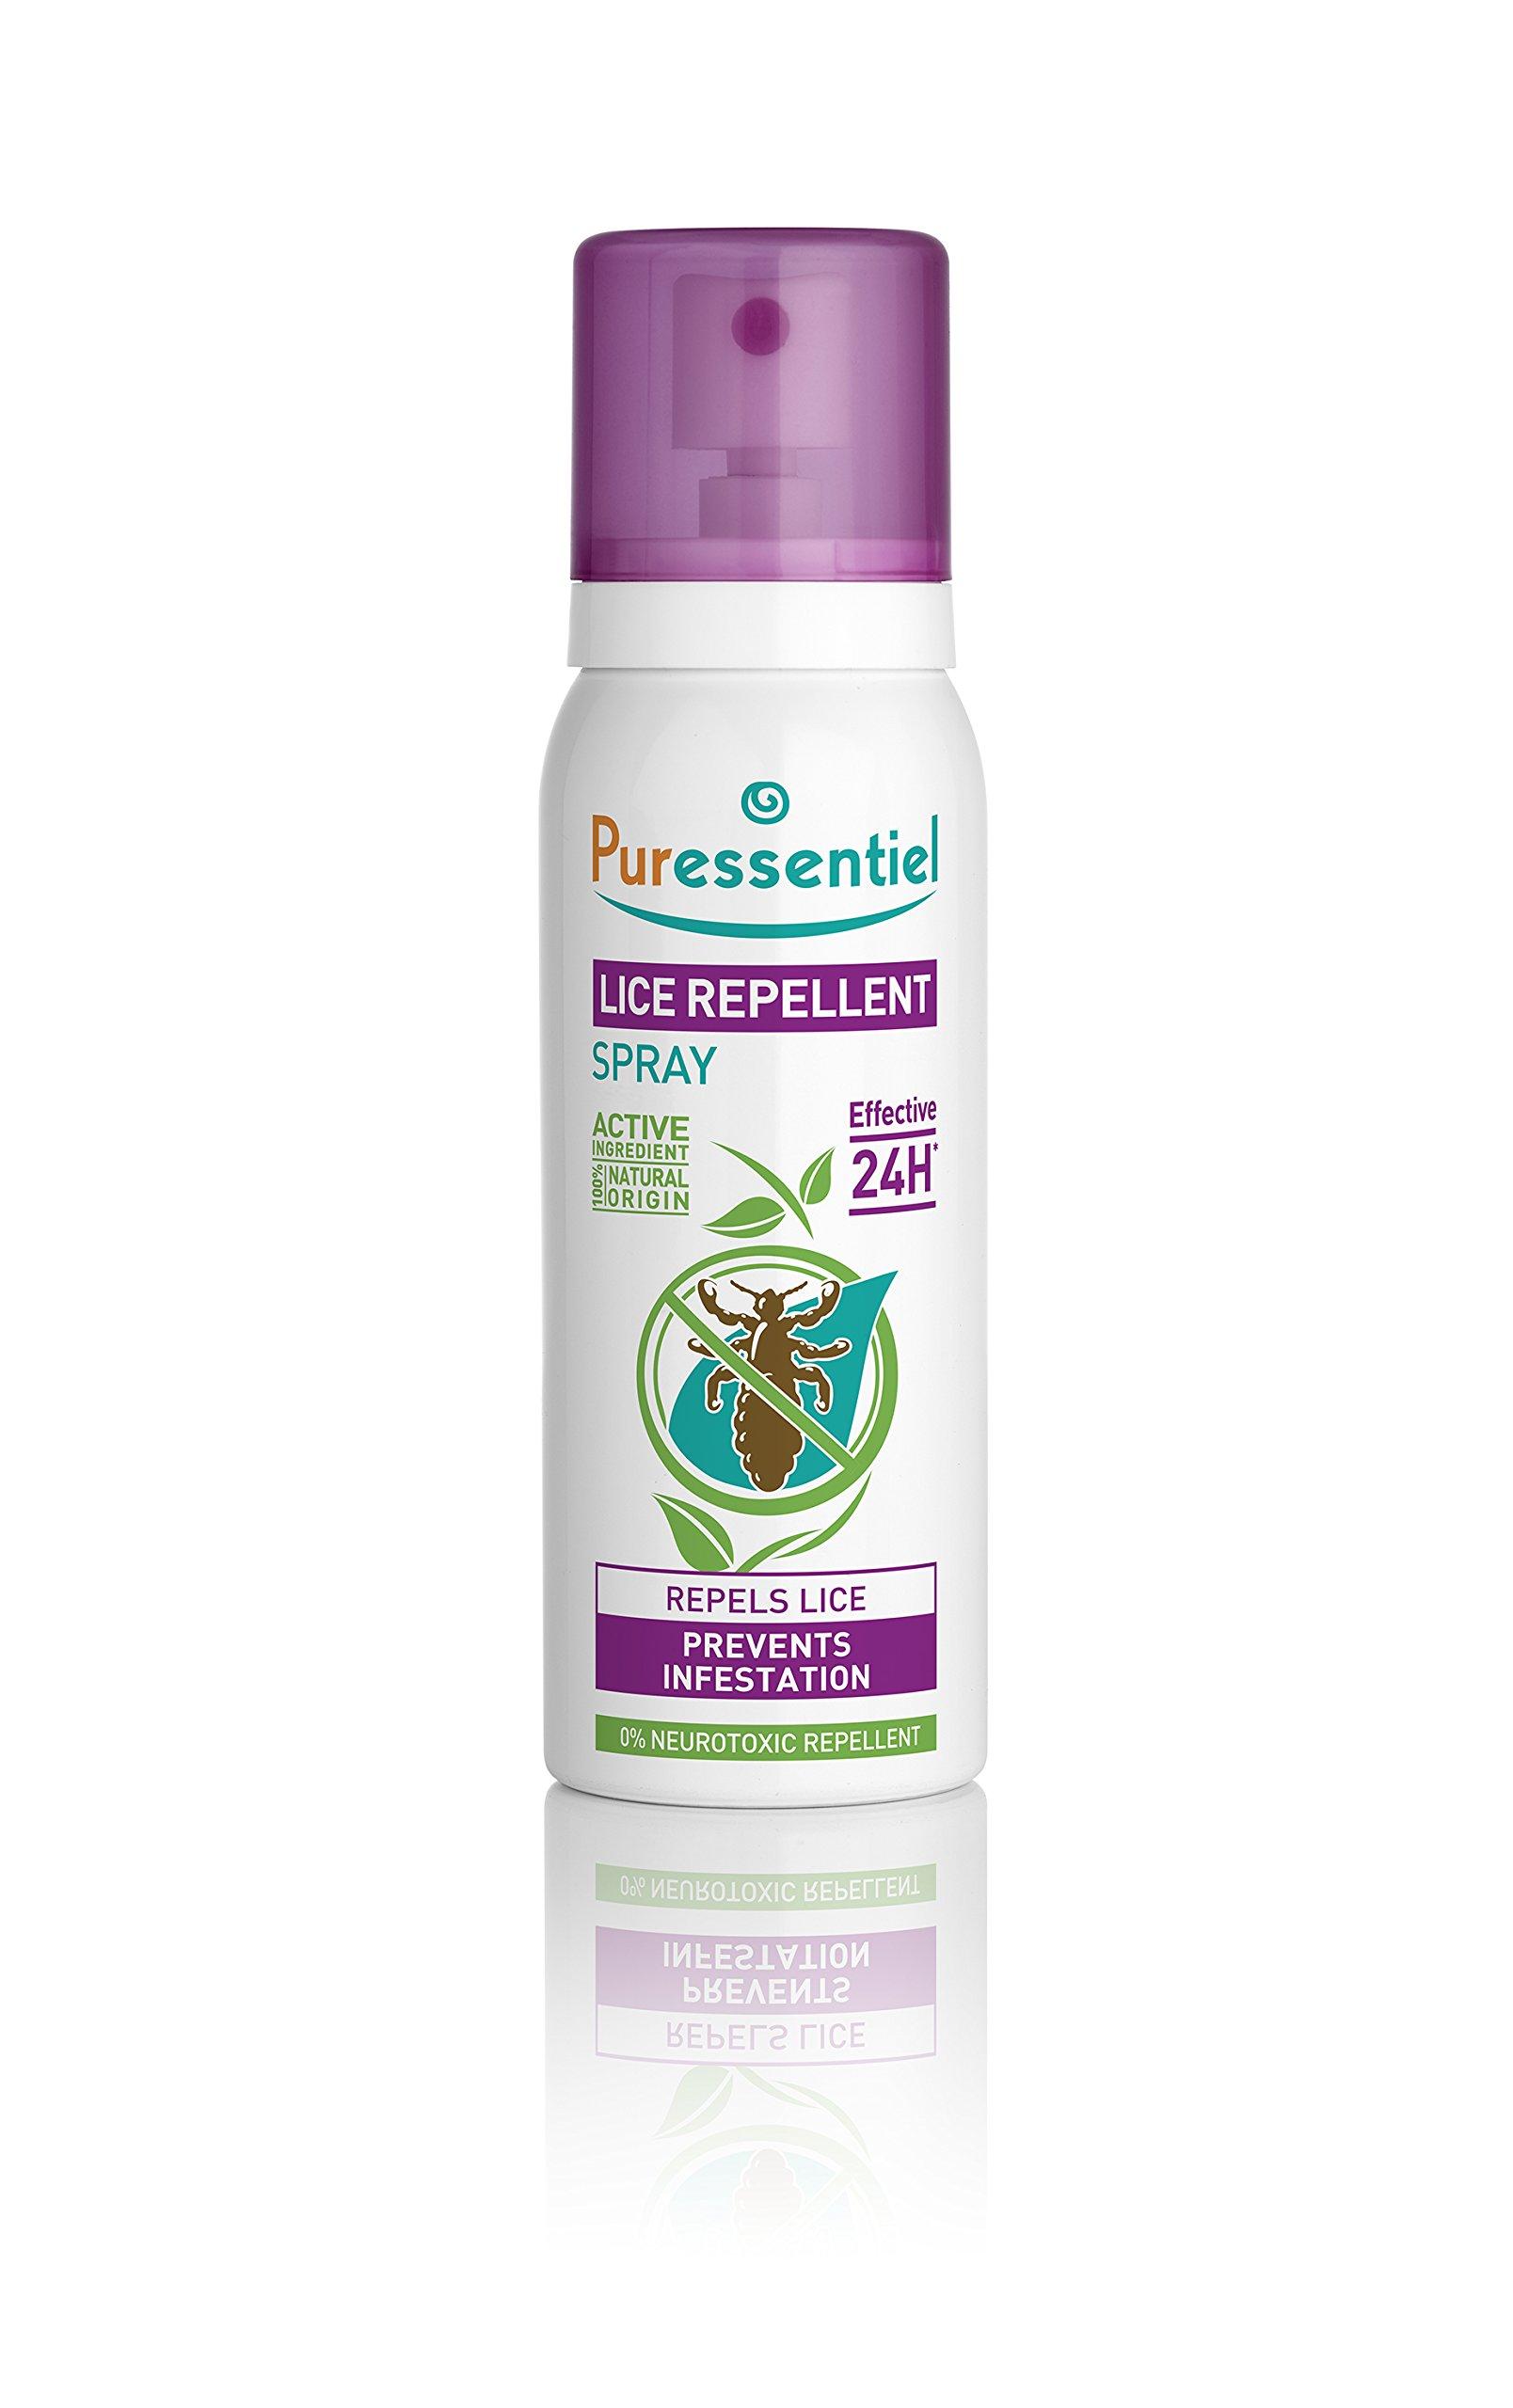 Puressentiel Repellent Lice Spray 75ml